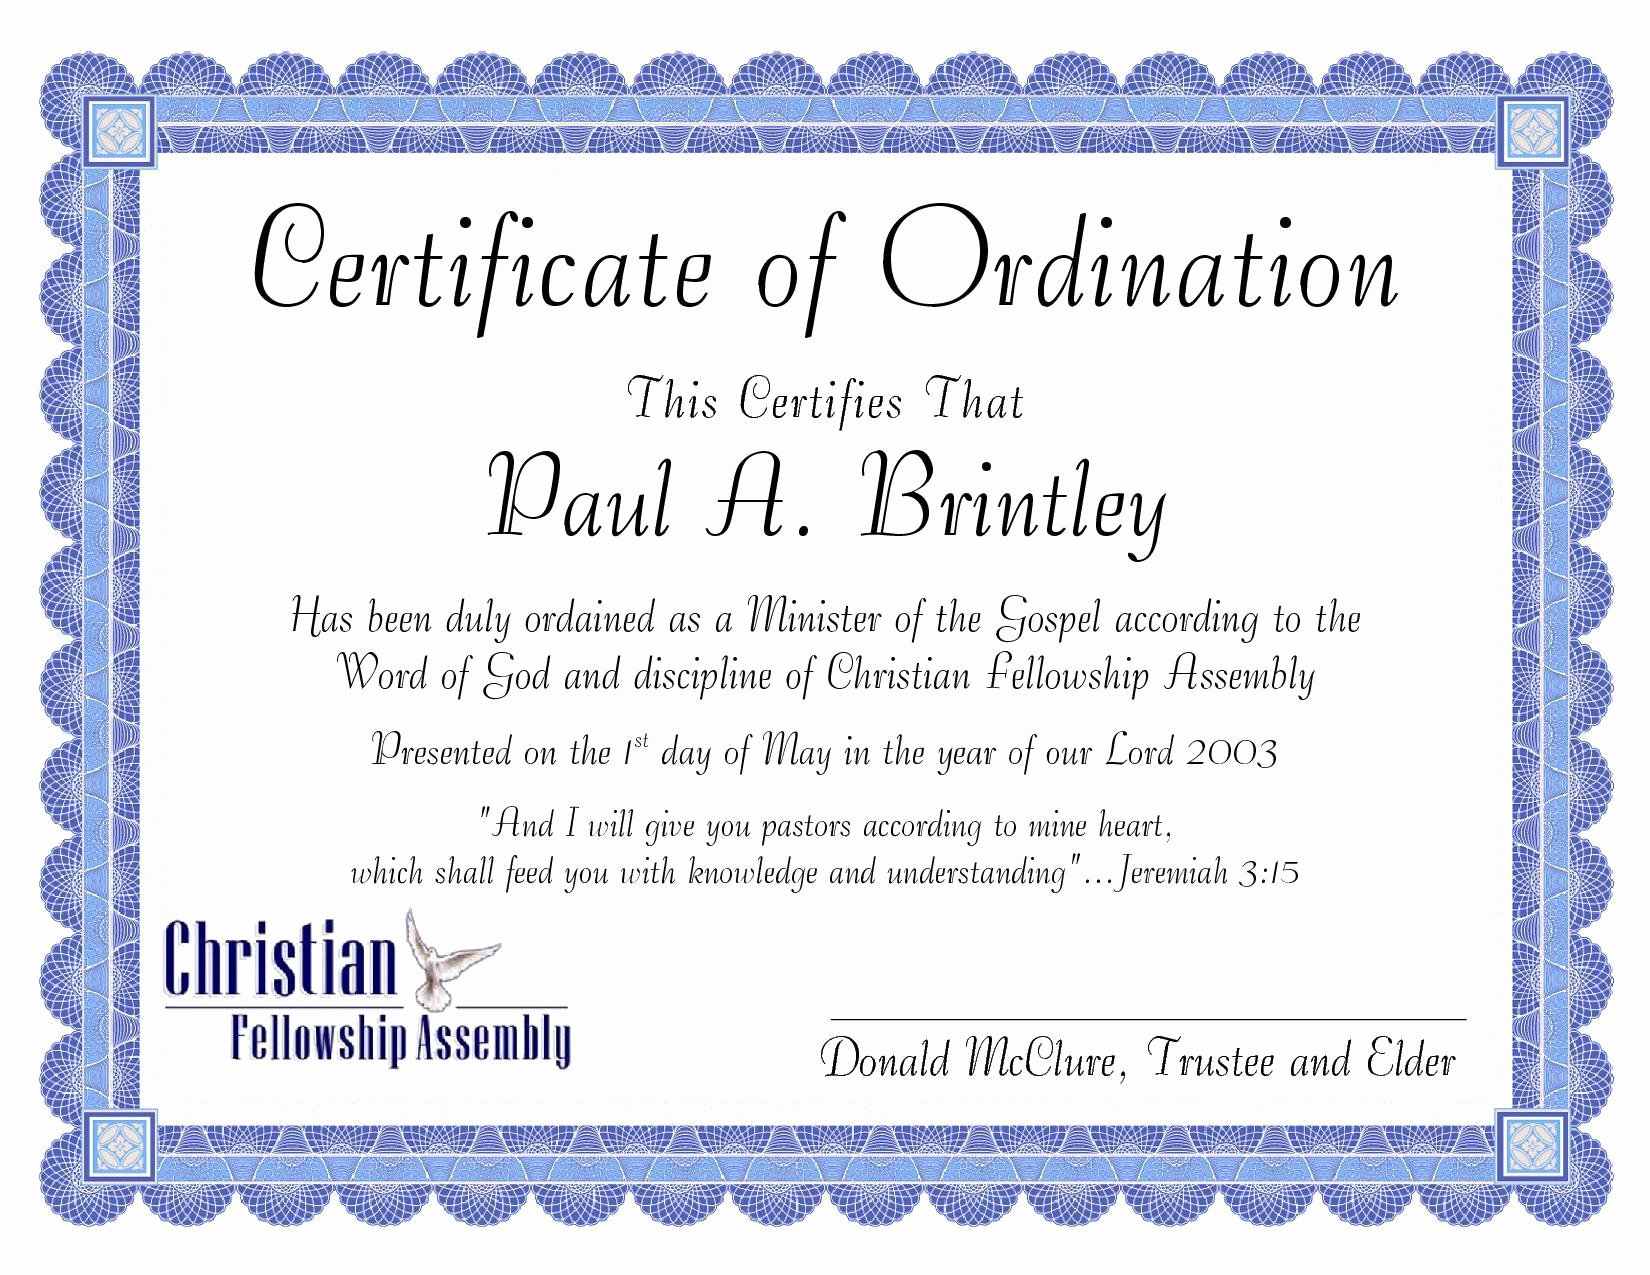 Minister ordination Certificate Template Luxury Pastoral ordination Certificate by Patricia Clay issuu